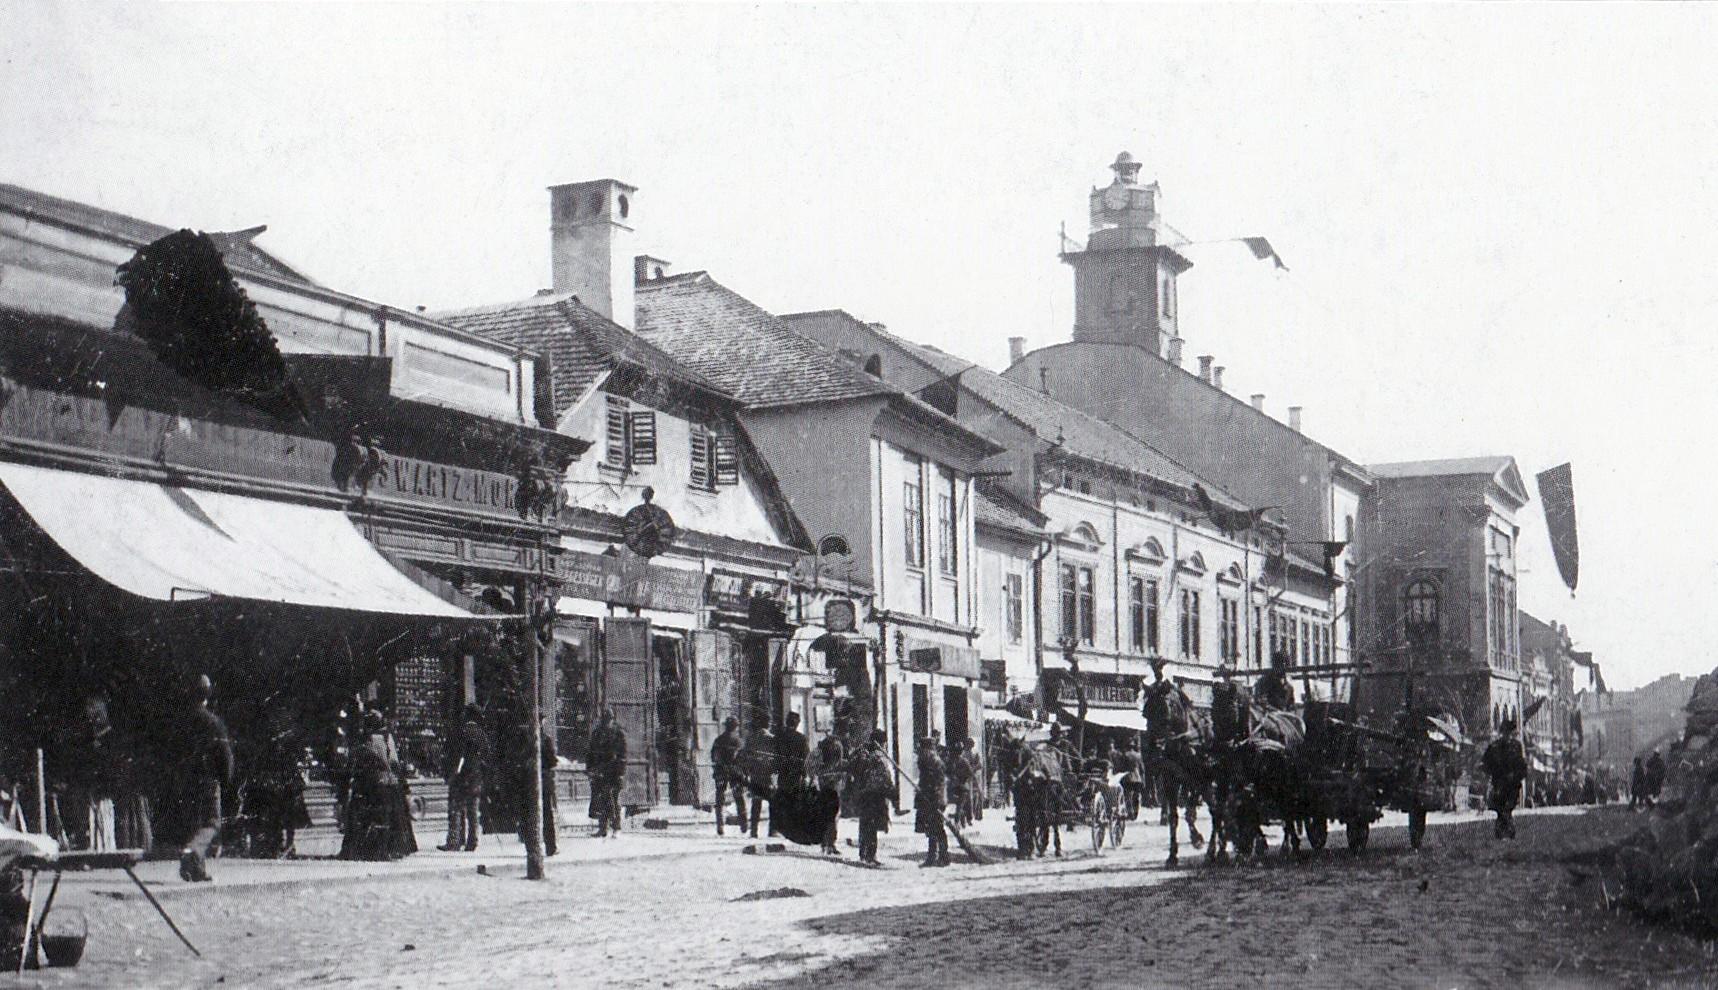 szechenyi_street_miskolc_before_1900.jpg